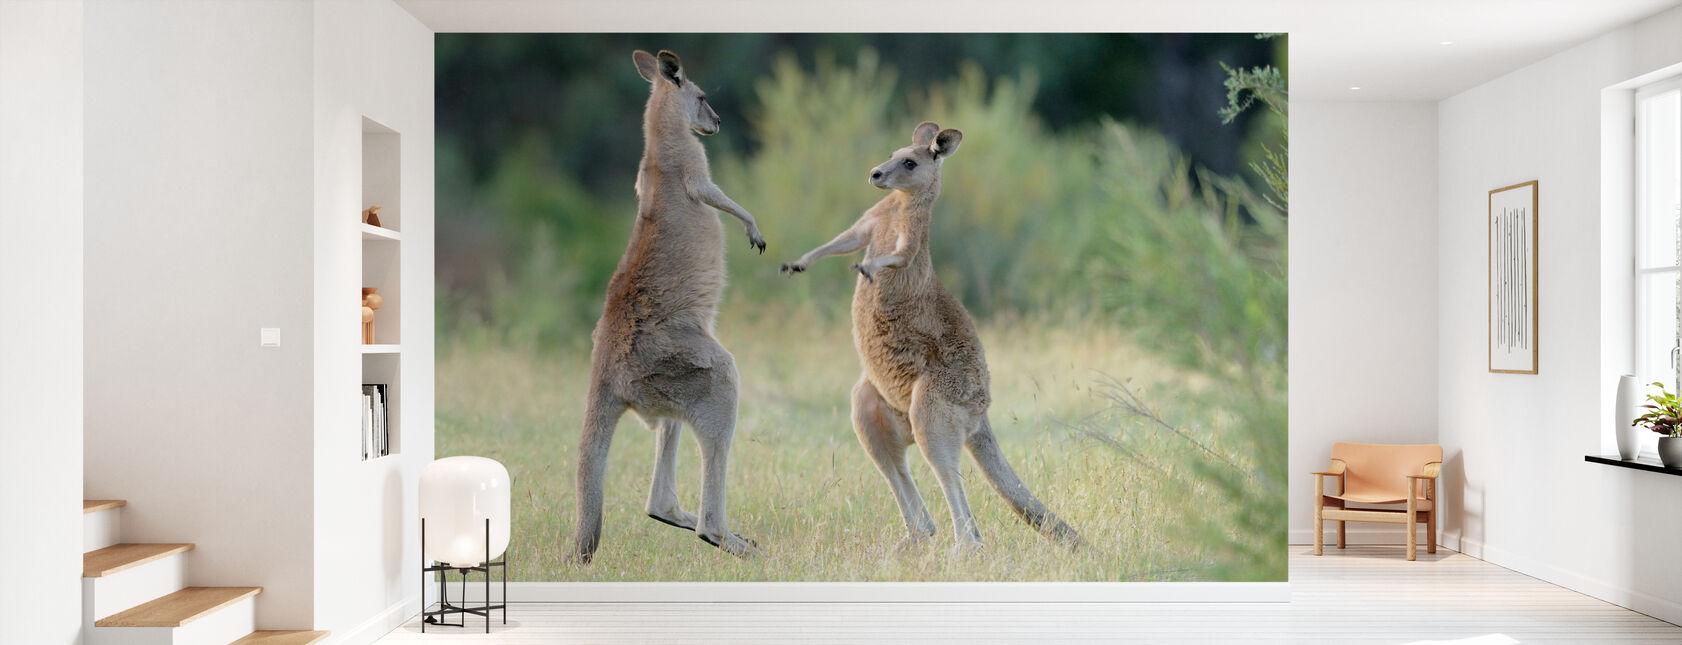 Eastern Grey Kangaroo - Wallpaper - Hallway